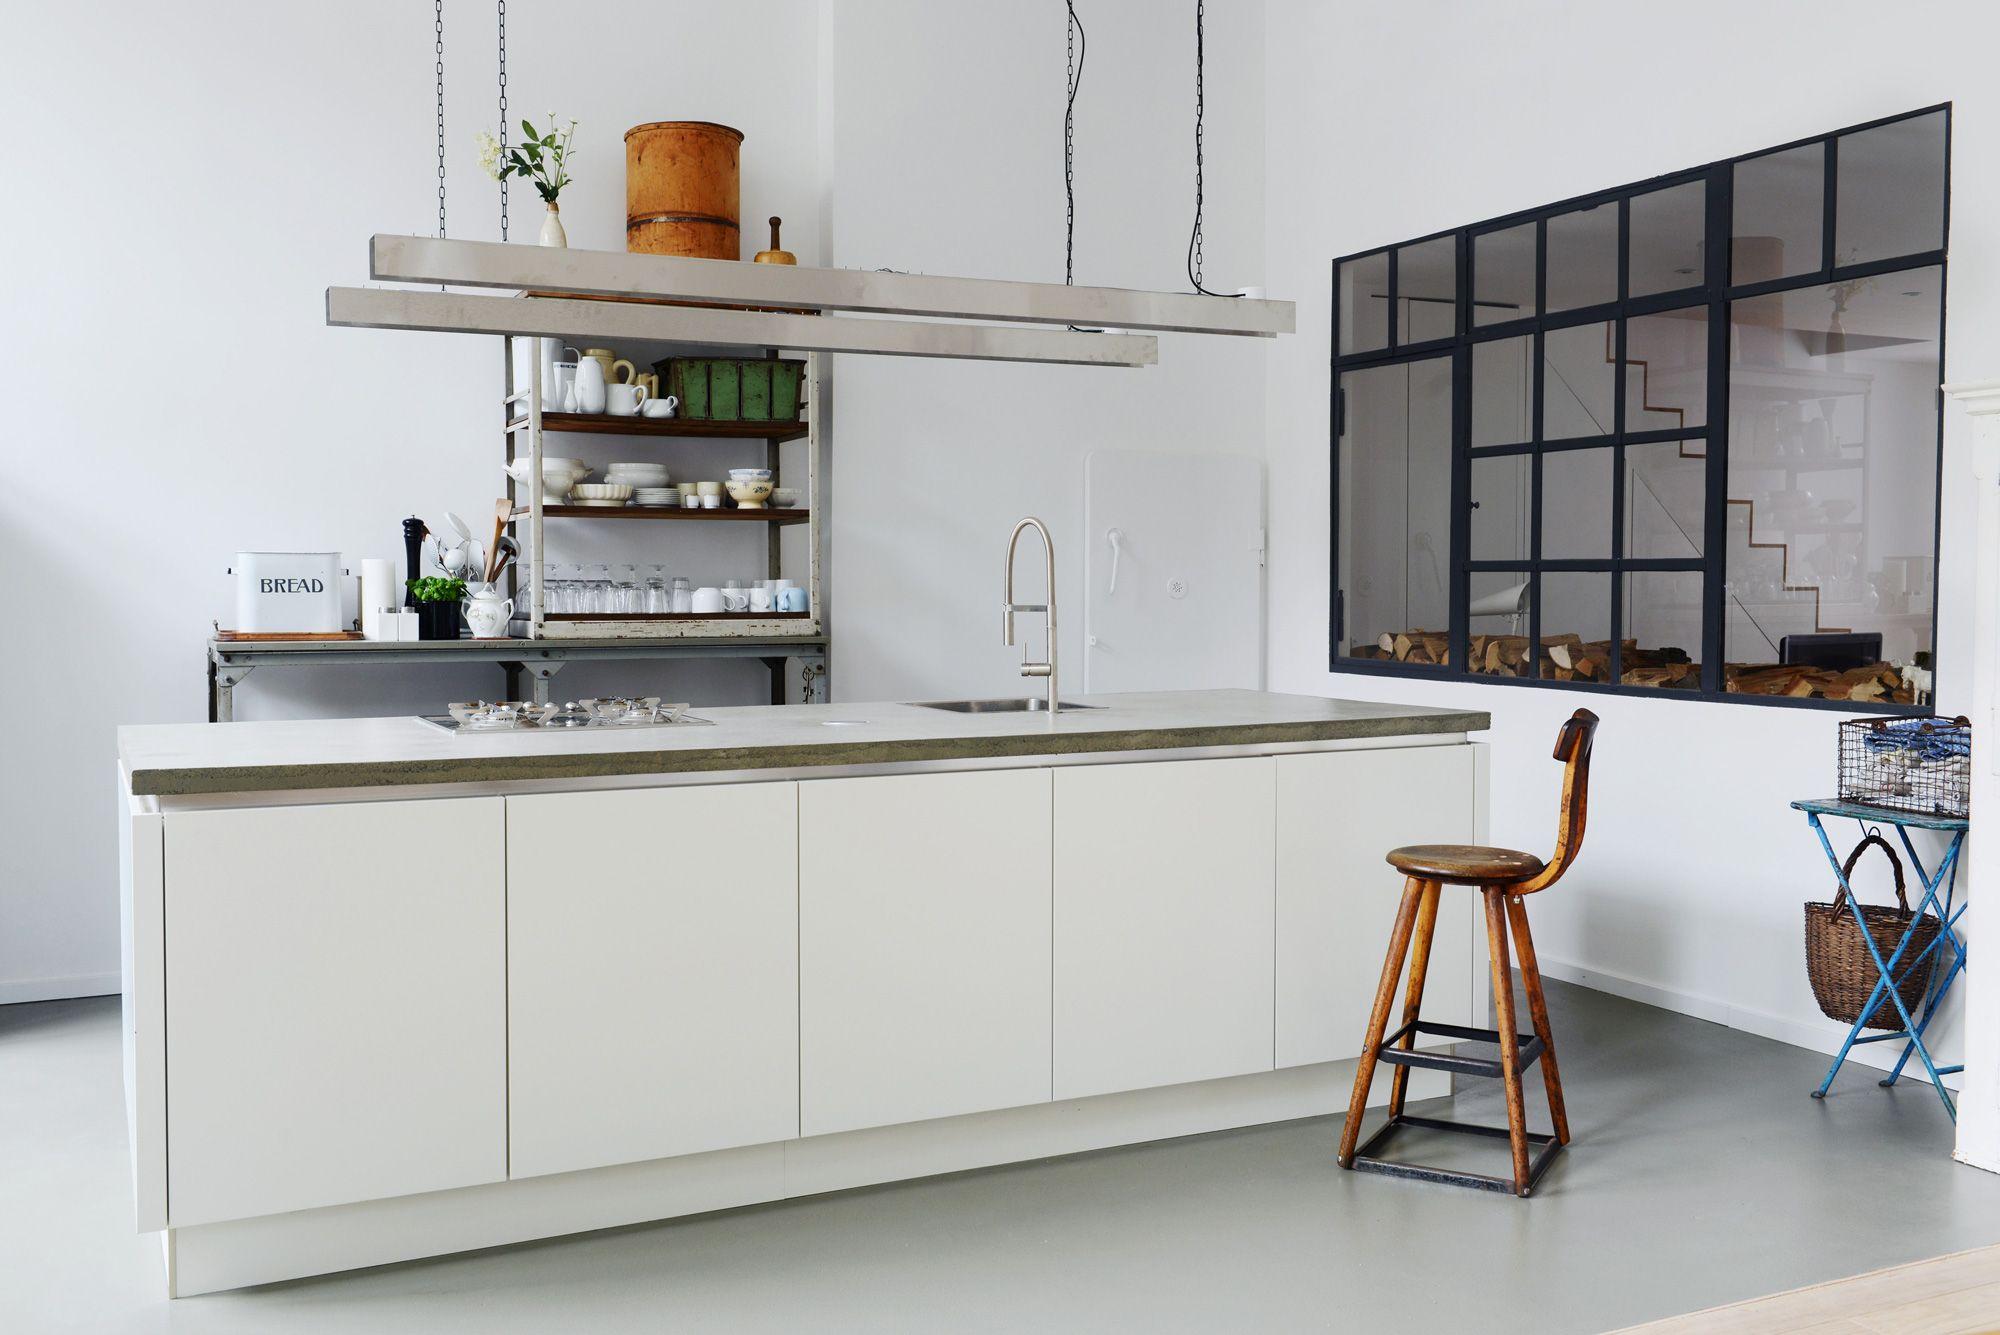 Beste Diy Küchen Auckland Fotos - Küchen Ideen Modern ...